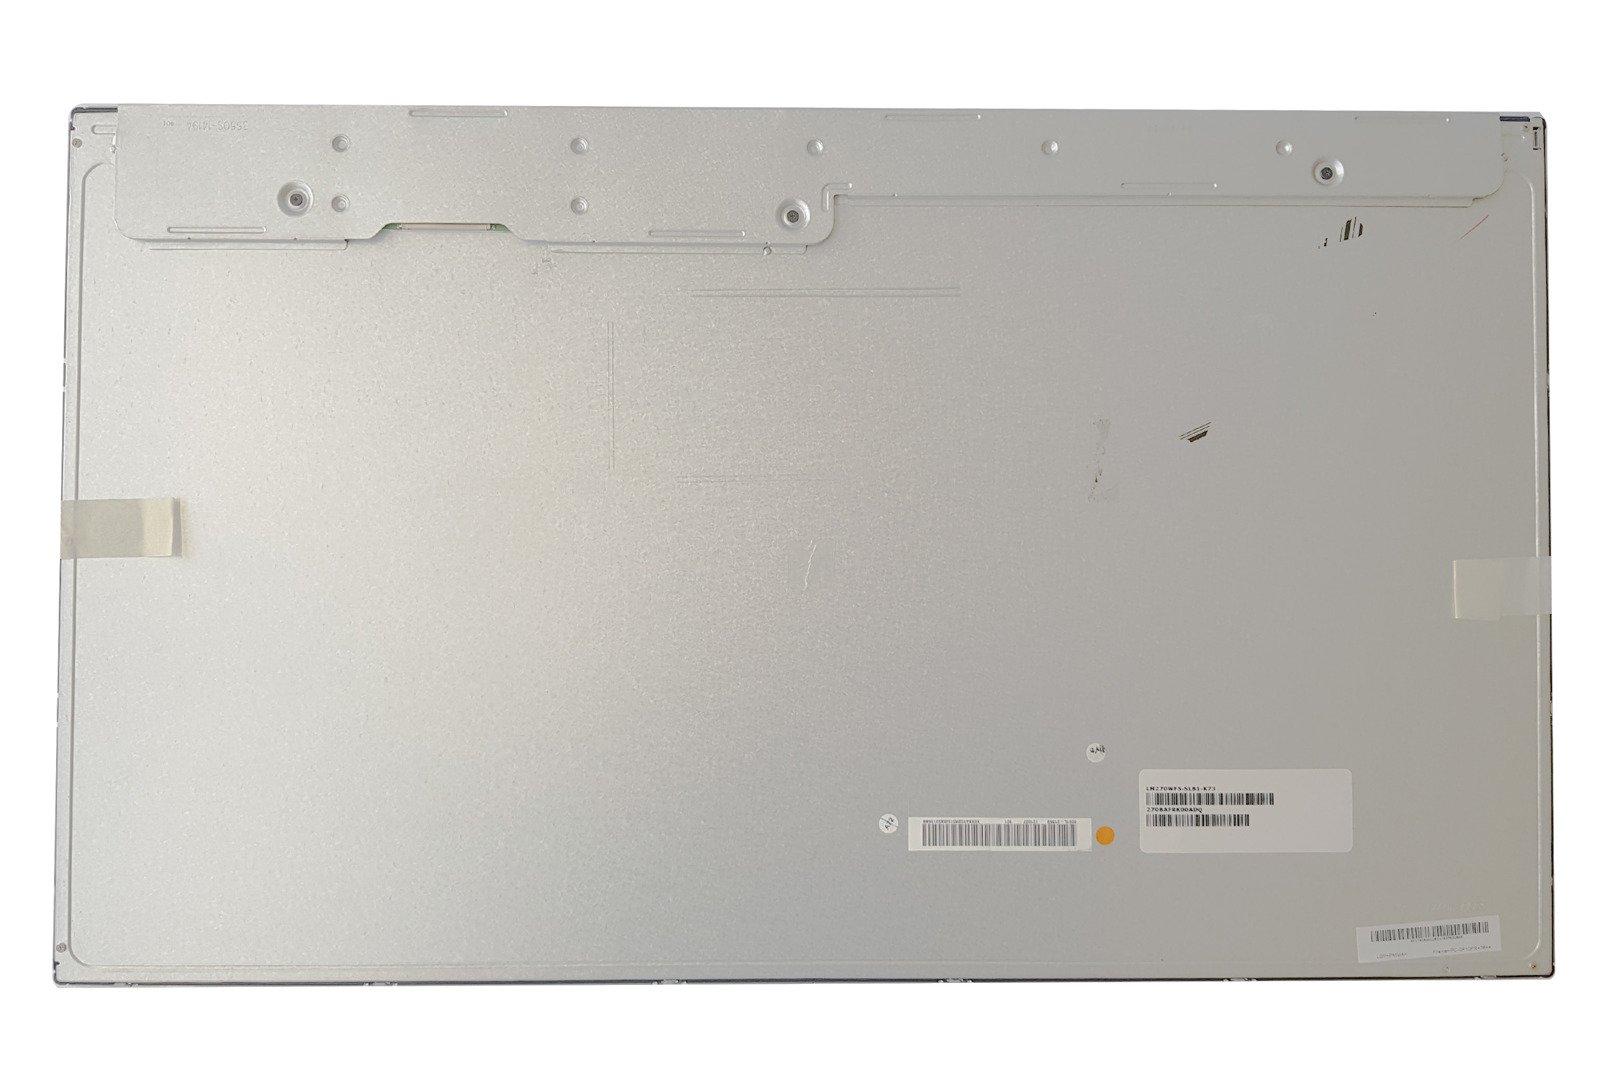 Display Panel Screen LG Display 27' LM270WF5-SLB1 1920 x 1080